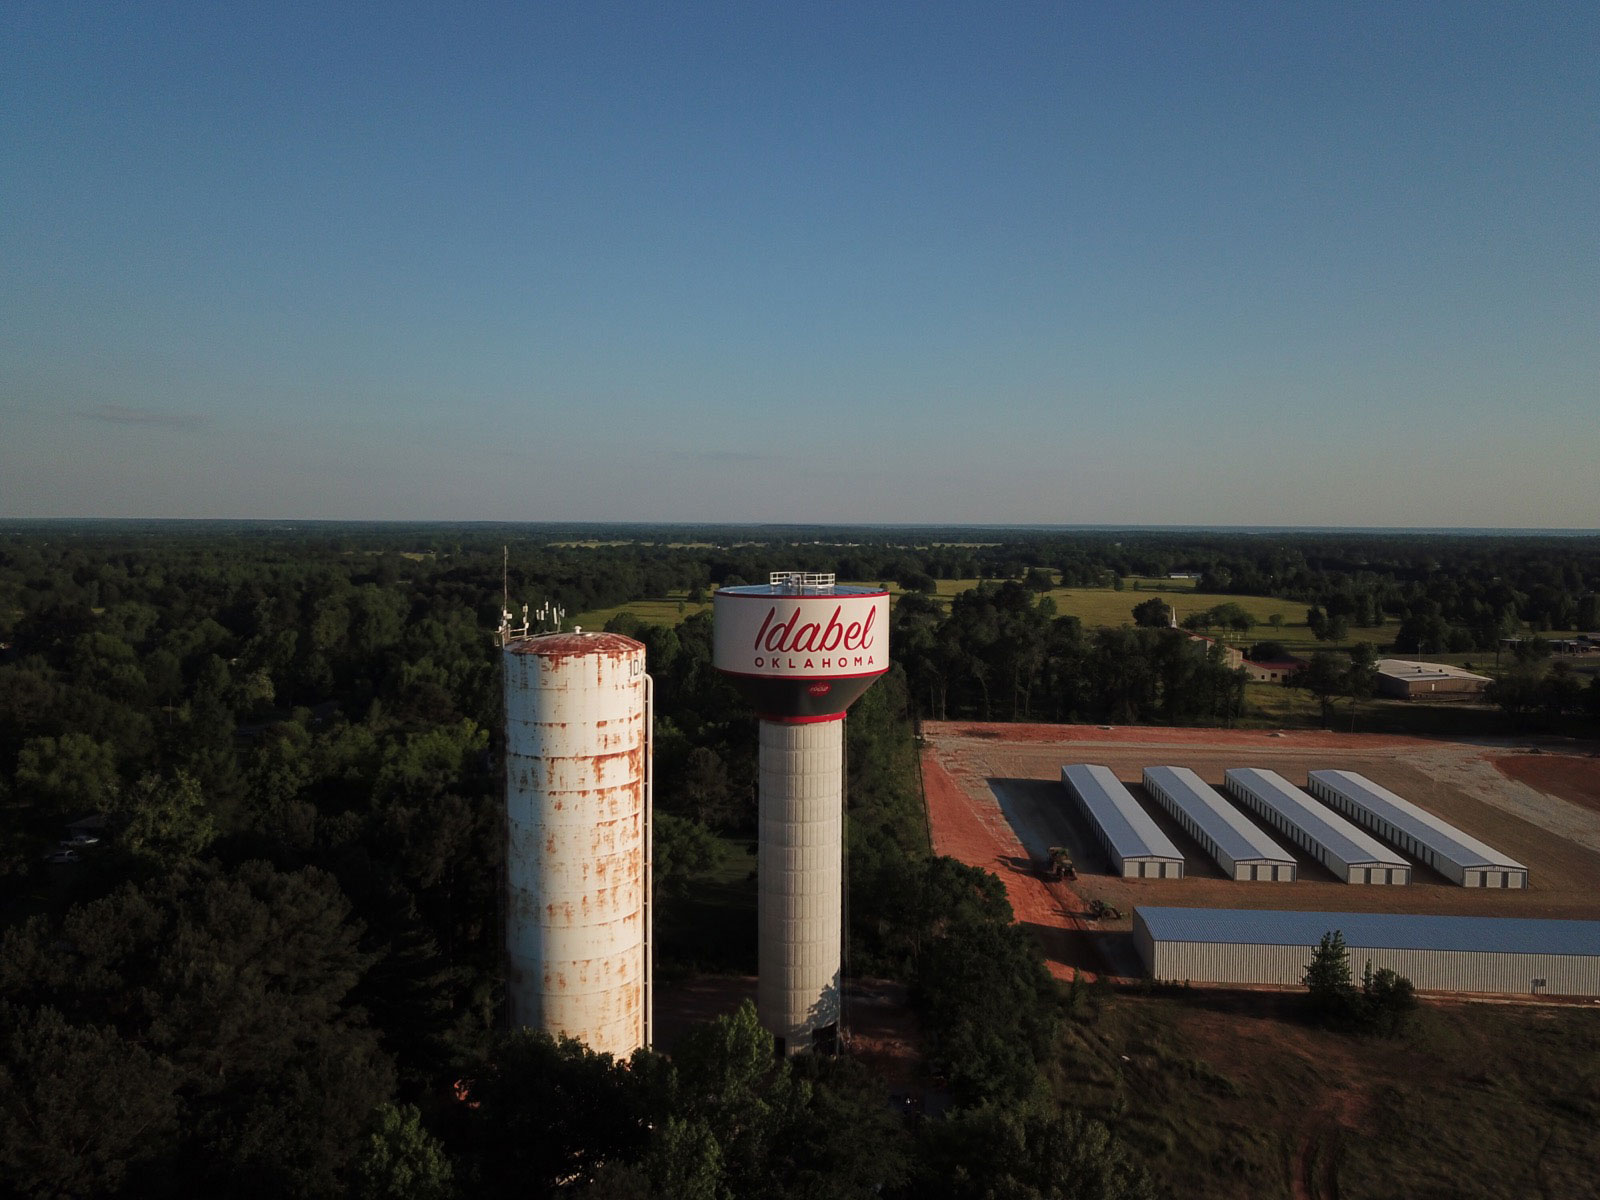 Idabel, Oklahoma, Induron, PermaGloss, Landmark Structures, Wall Engineering